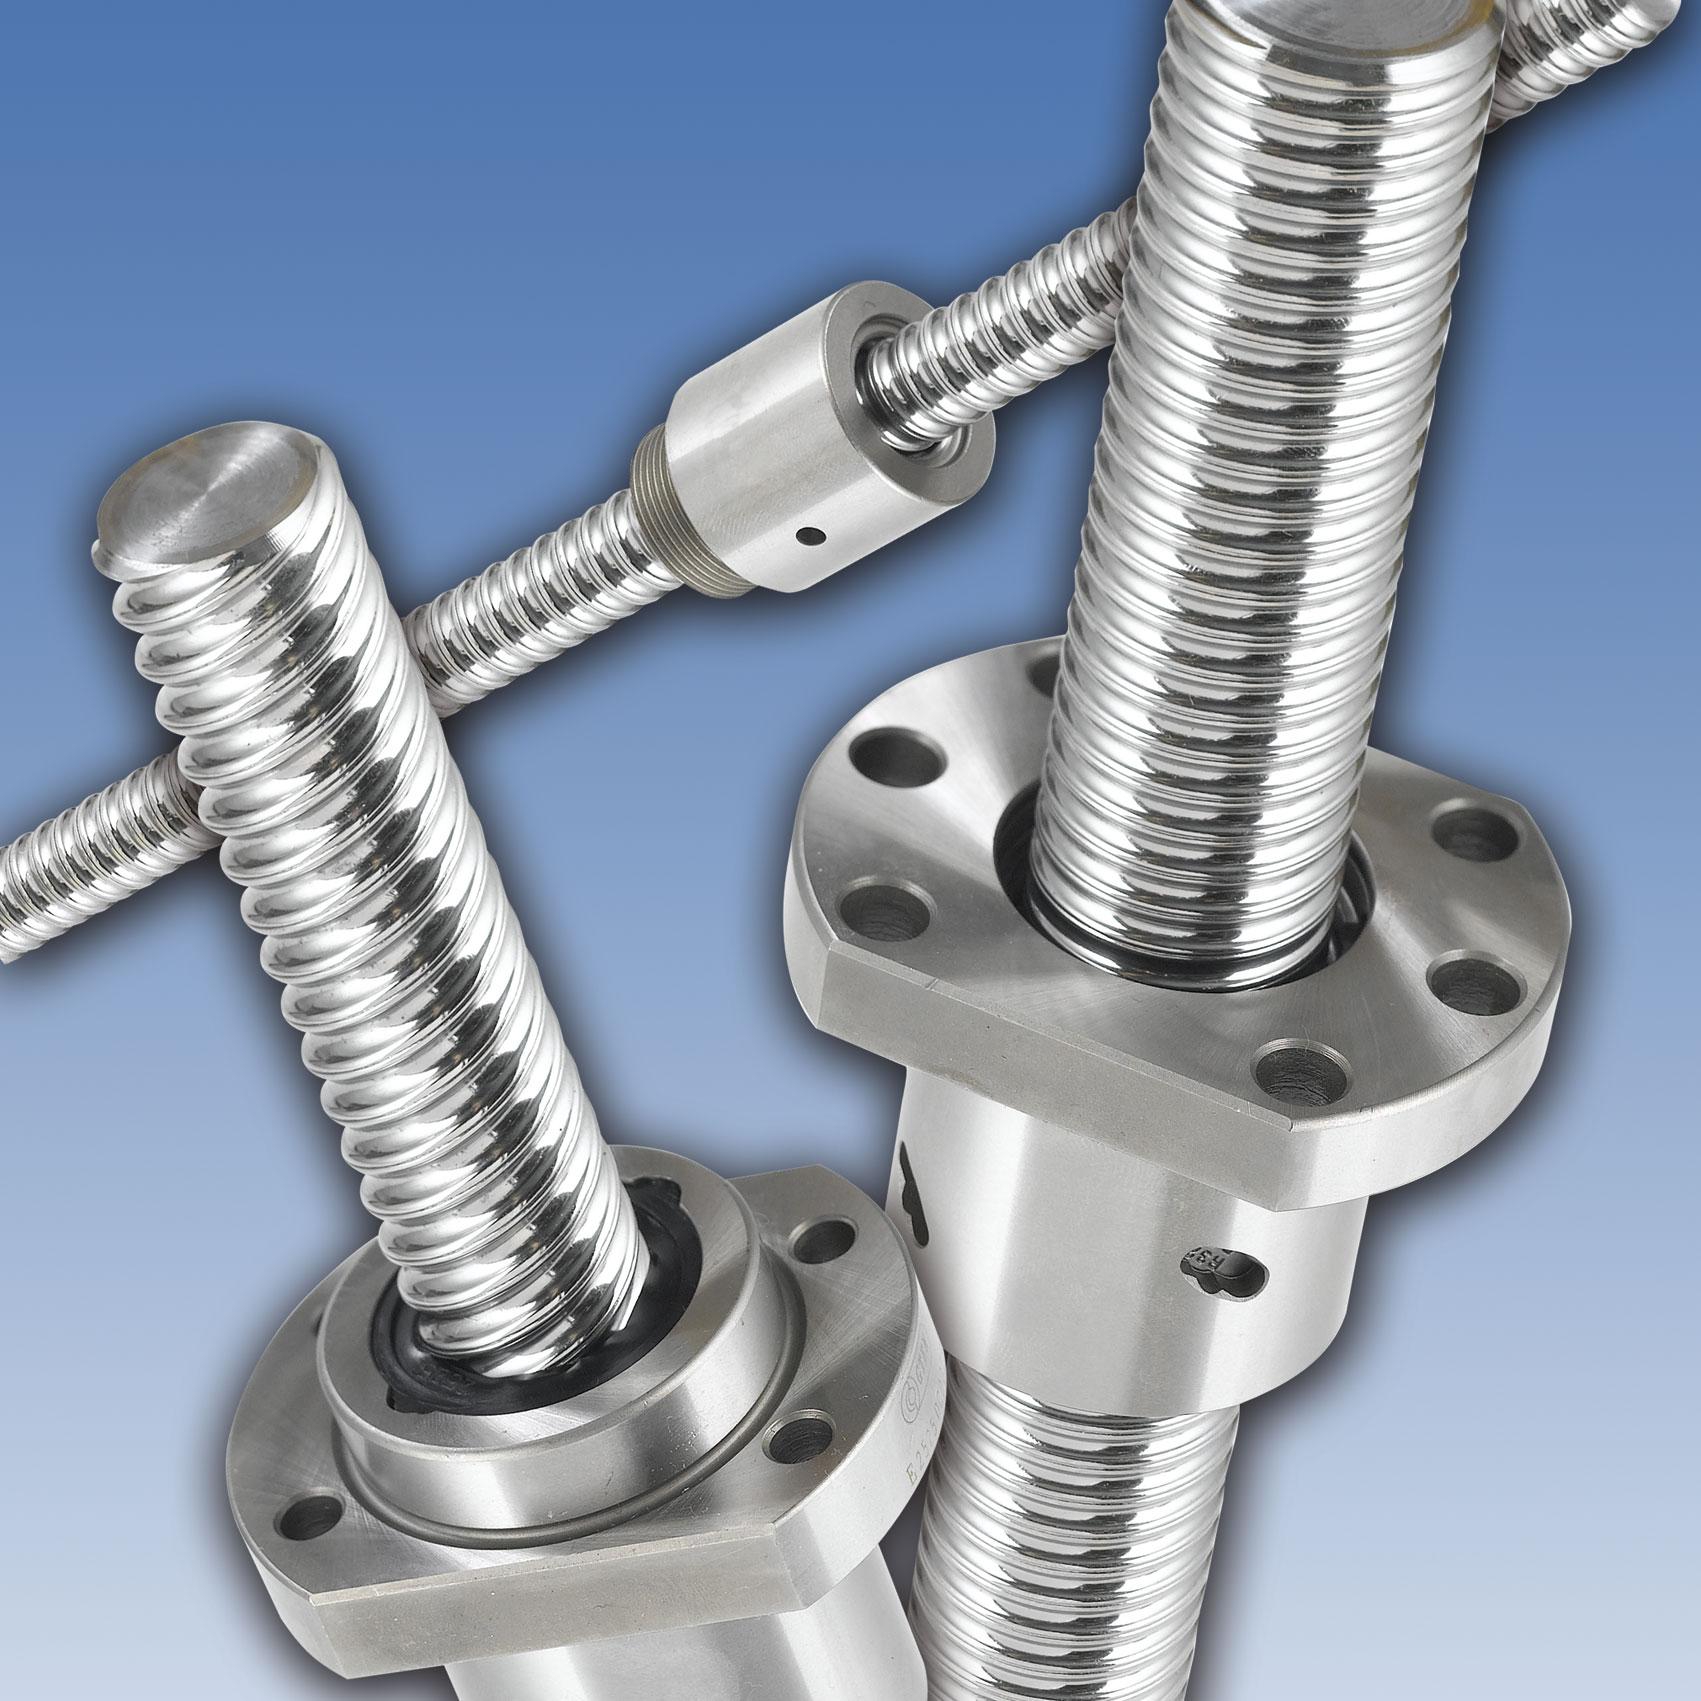 Ball-screw